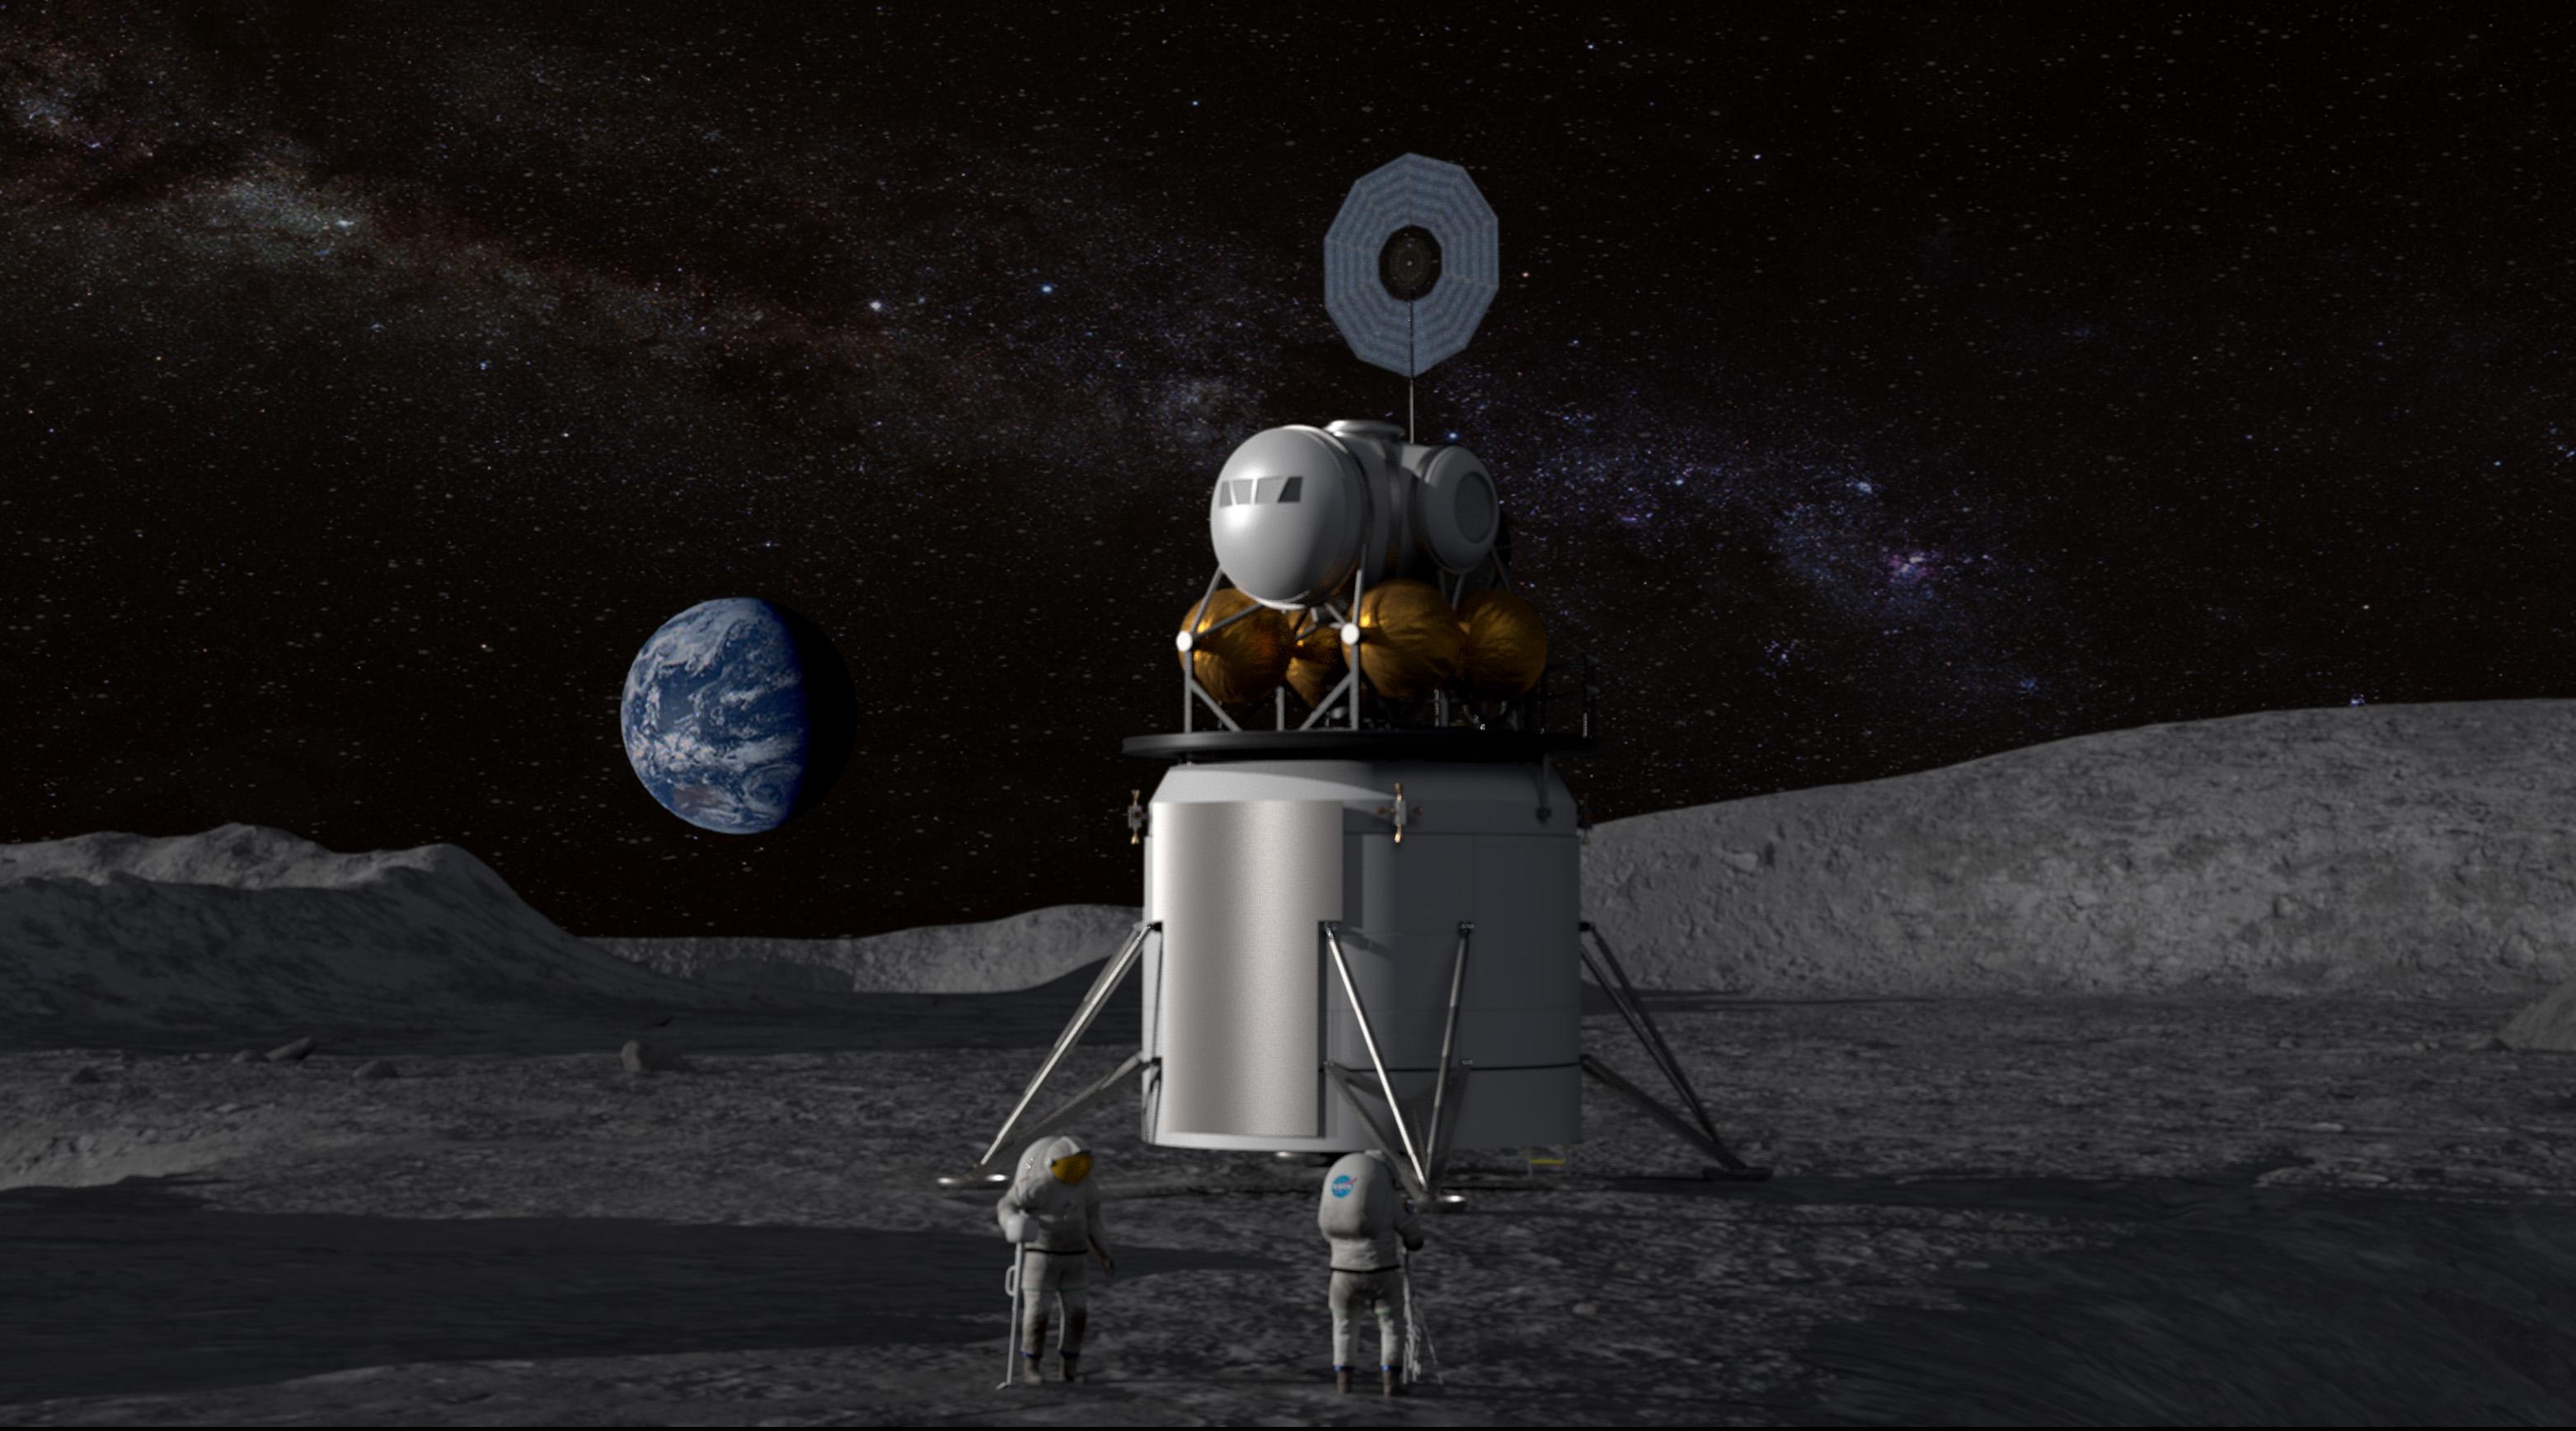 NASA Announces Industry Partnerships to Advance Moon, Mars